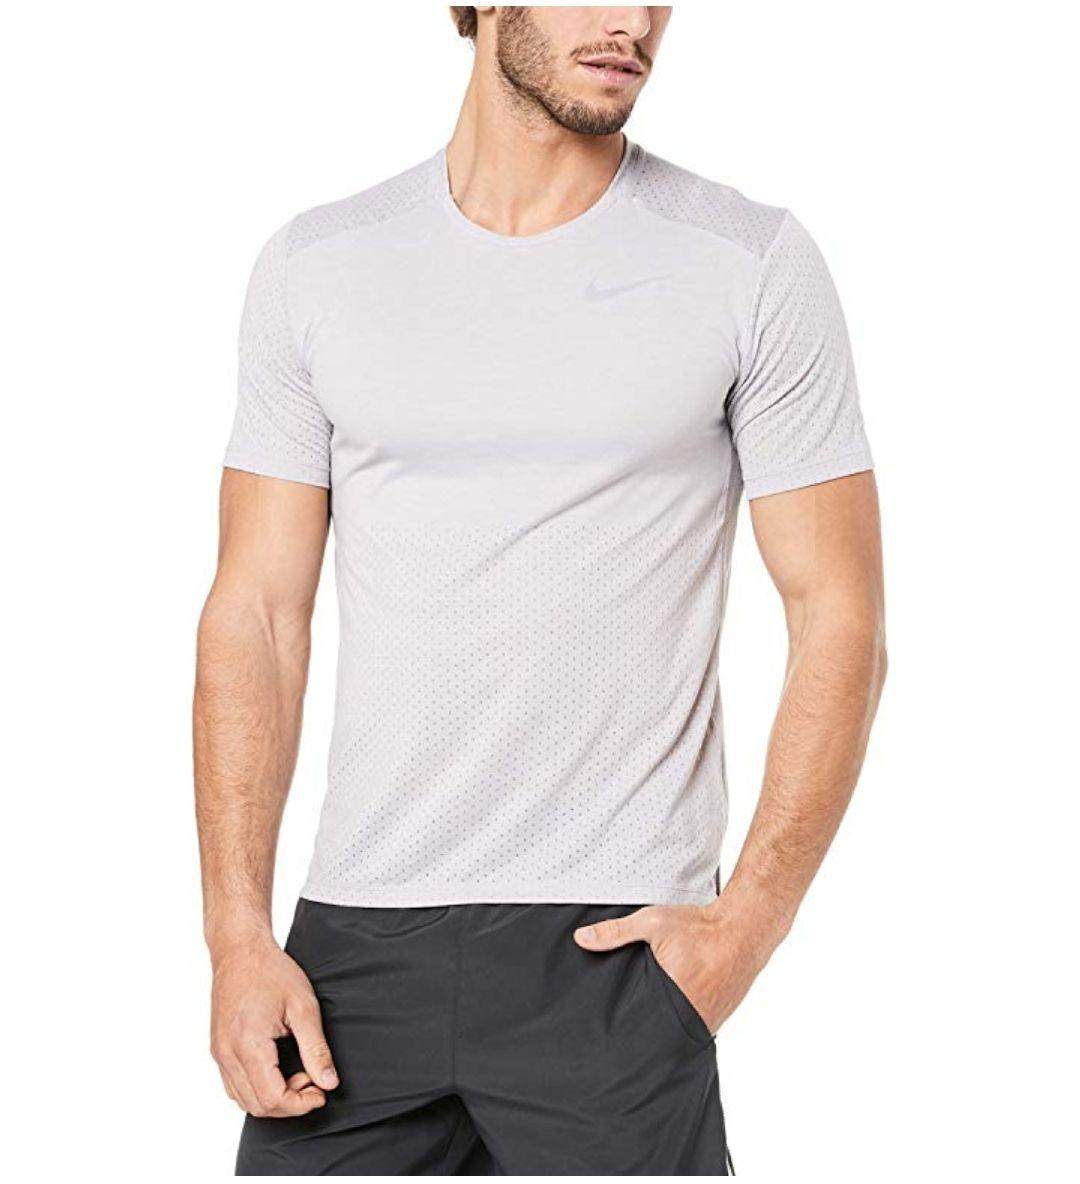 TALLA S - color gris - Nike M Nk Brthe Rise 365 SS Camiseta, Hombre